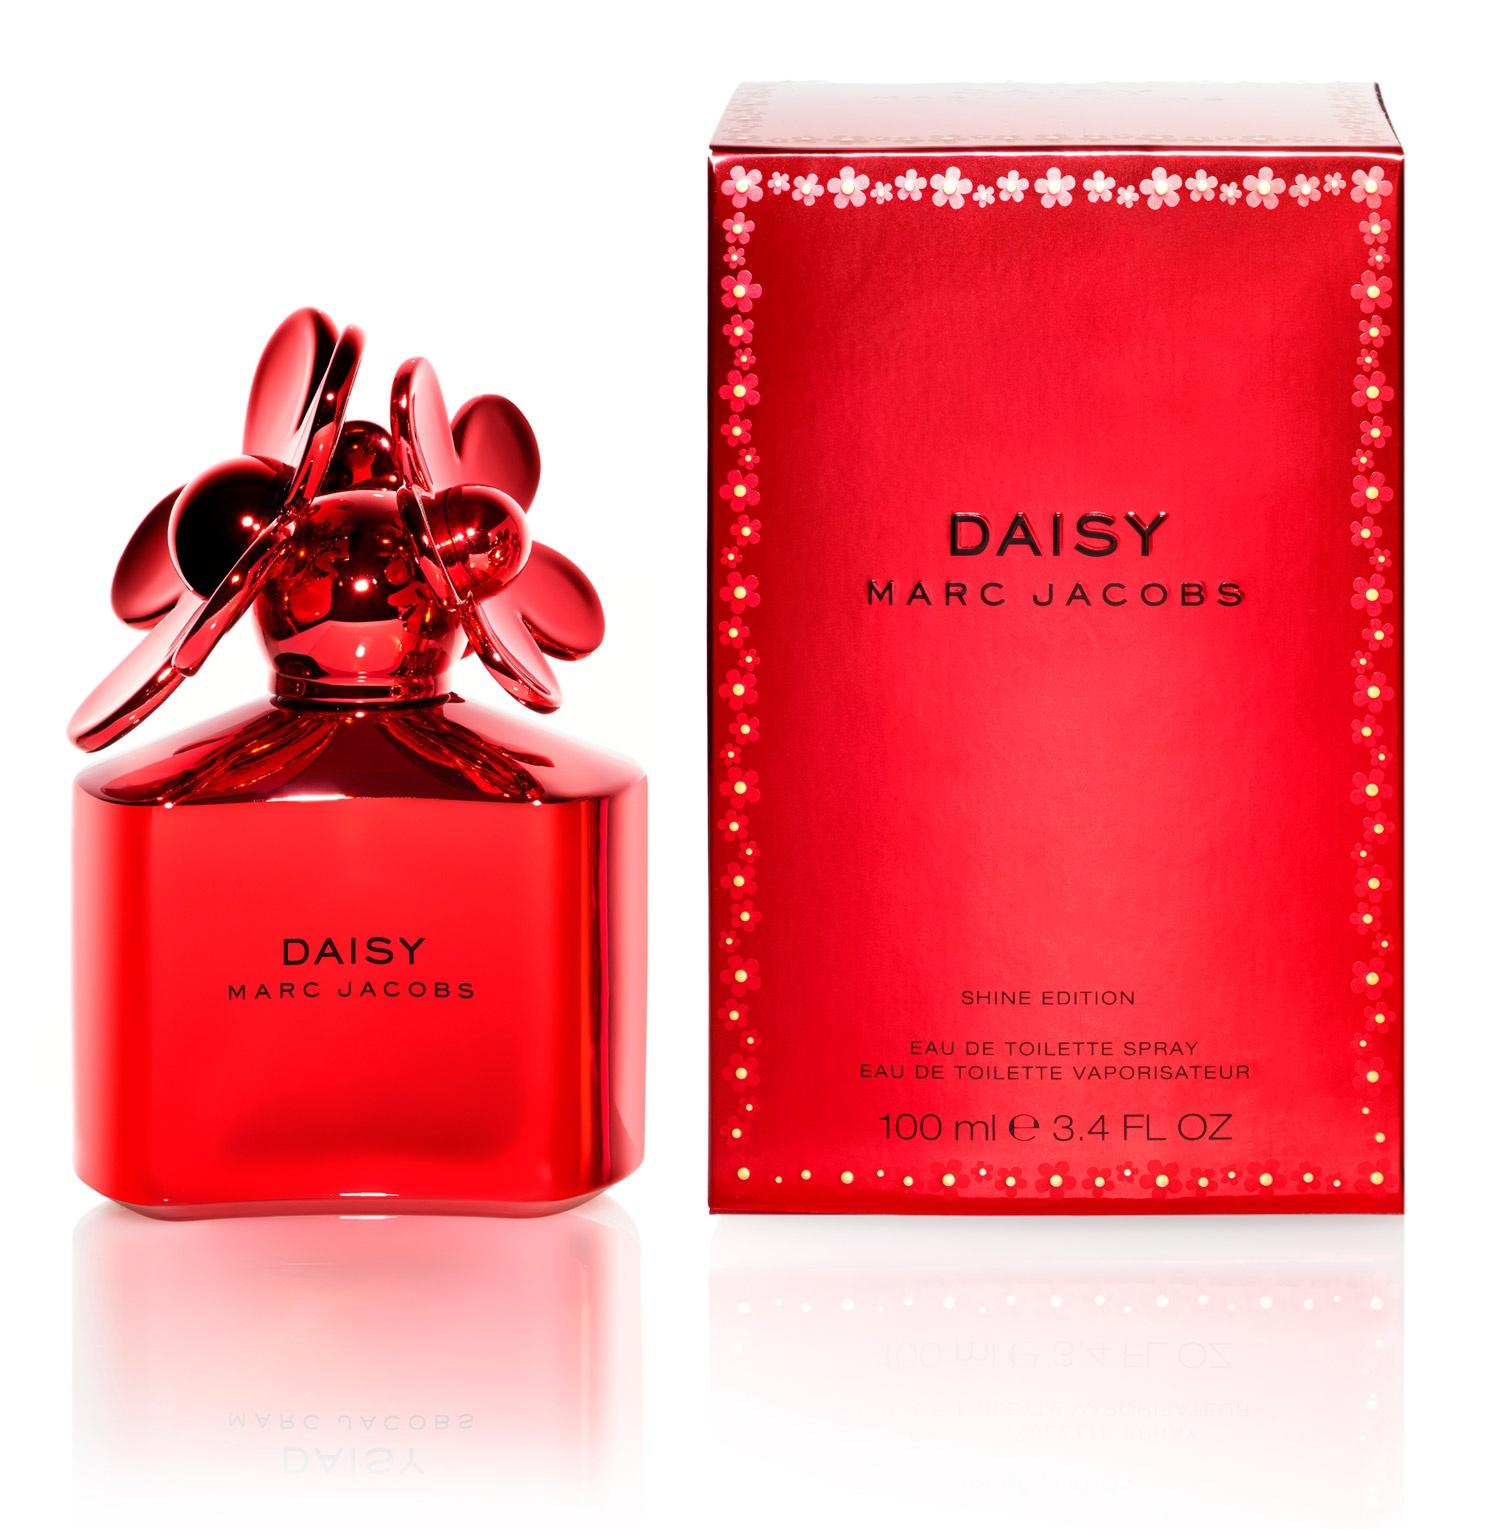 Marc Jacobs Daisy Shine Red Edition toaletní voda